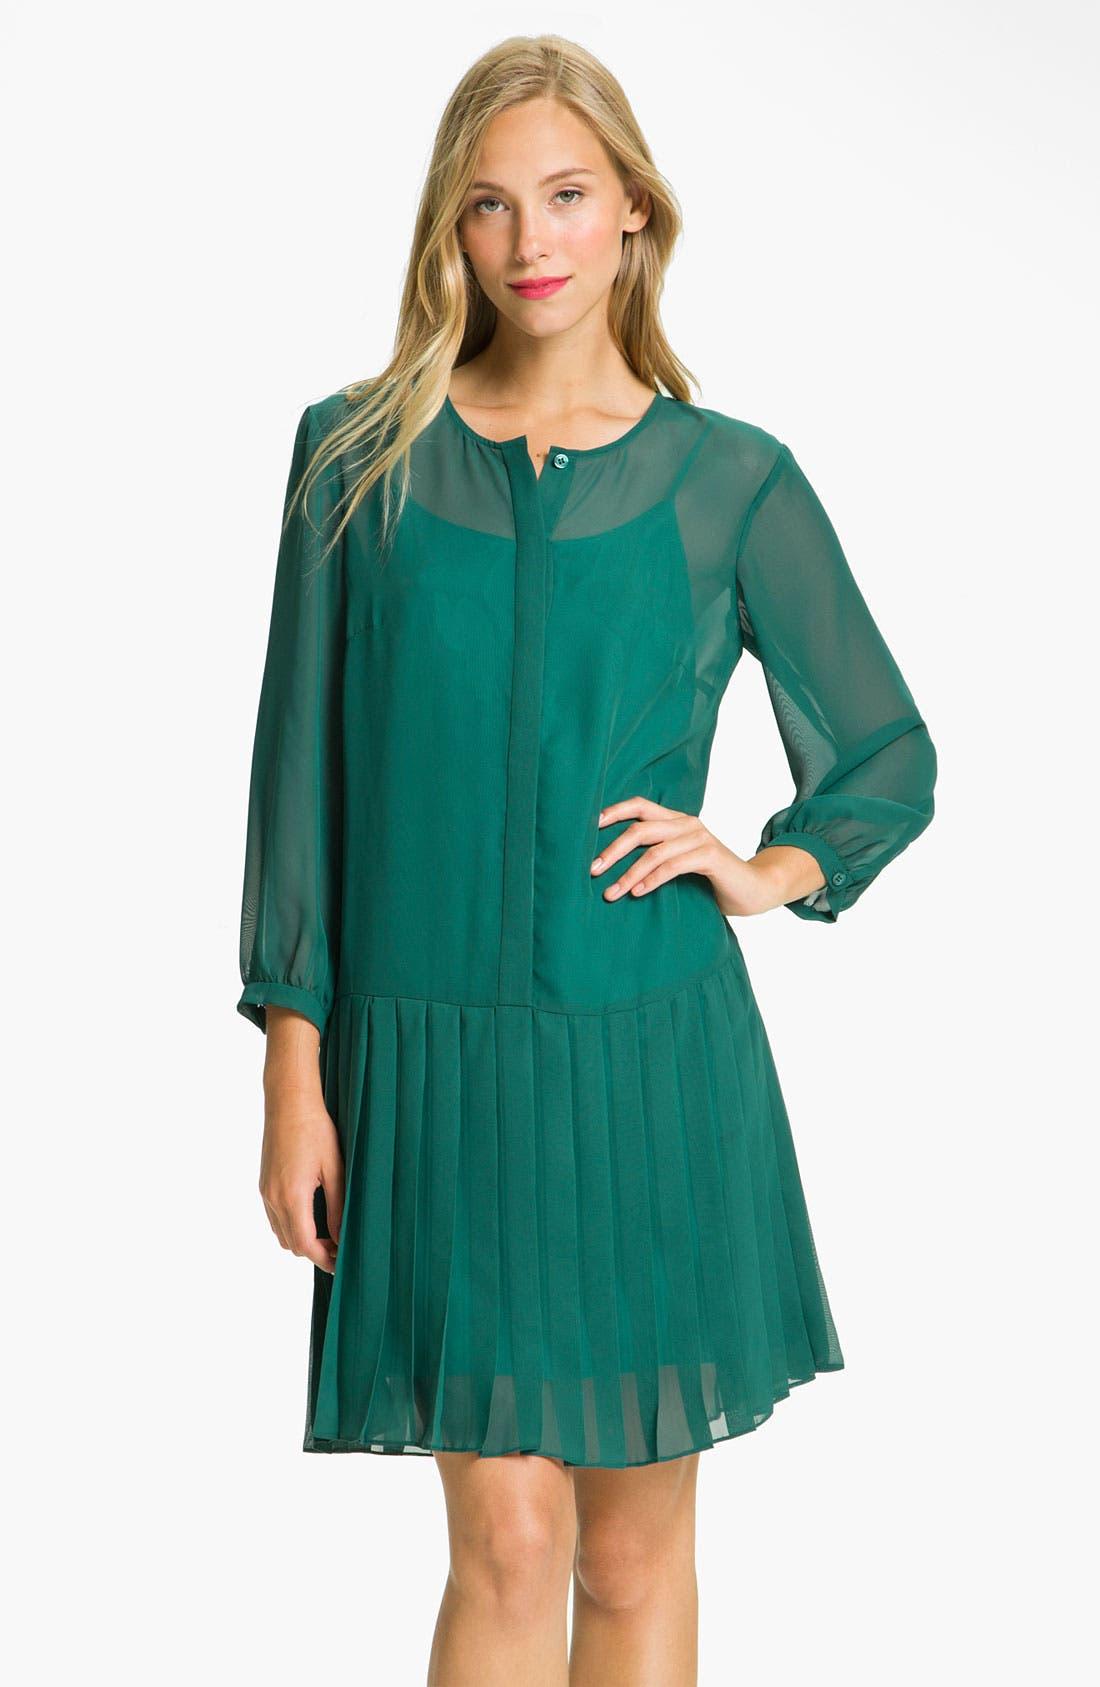 Alternate Image 1 Selected - Donna Morgan Drop Waist Chiffon Blouson Dress